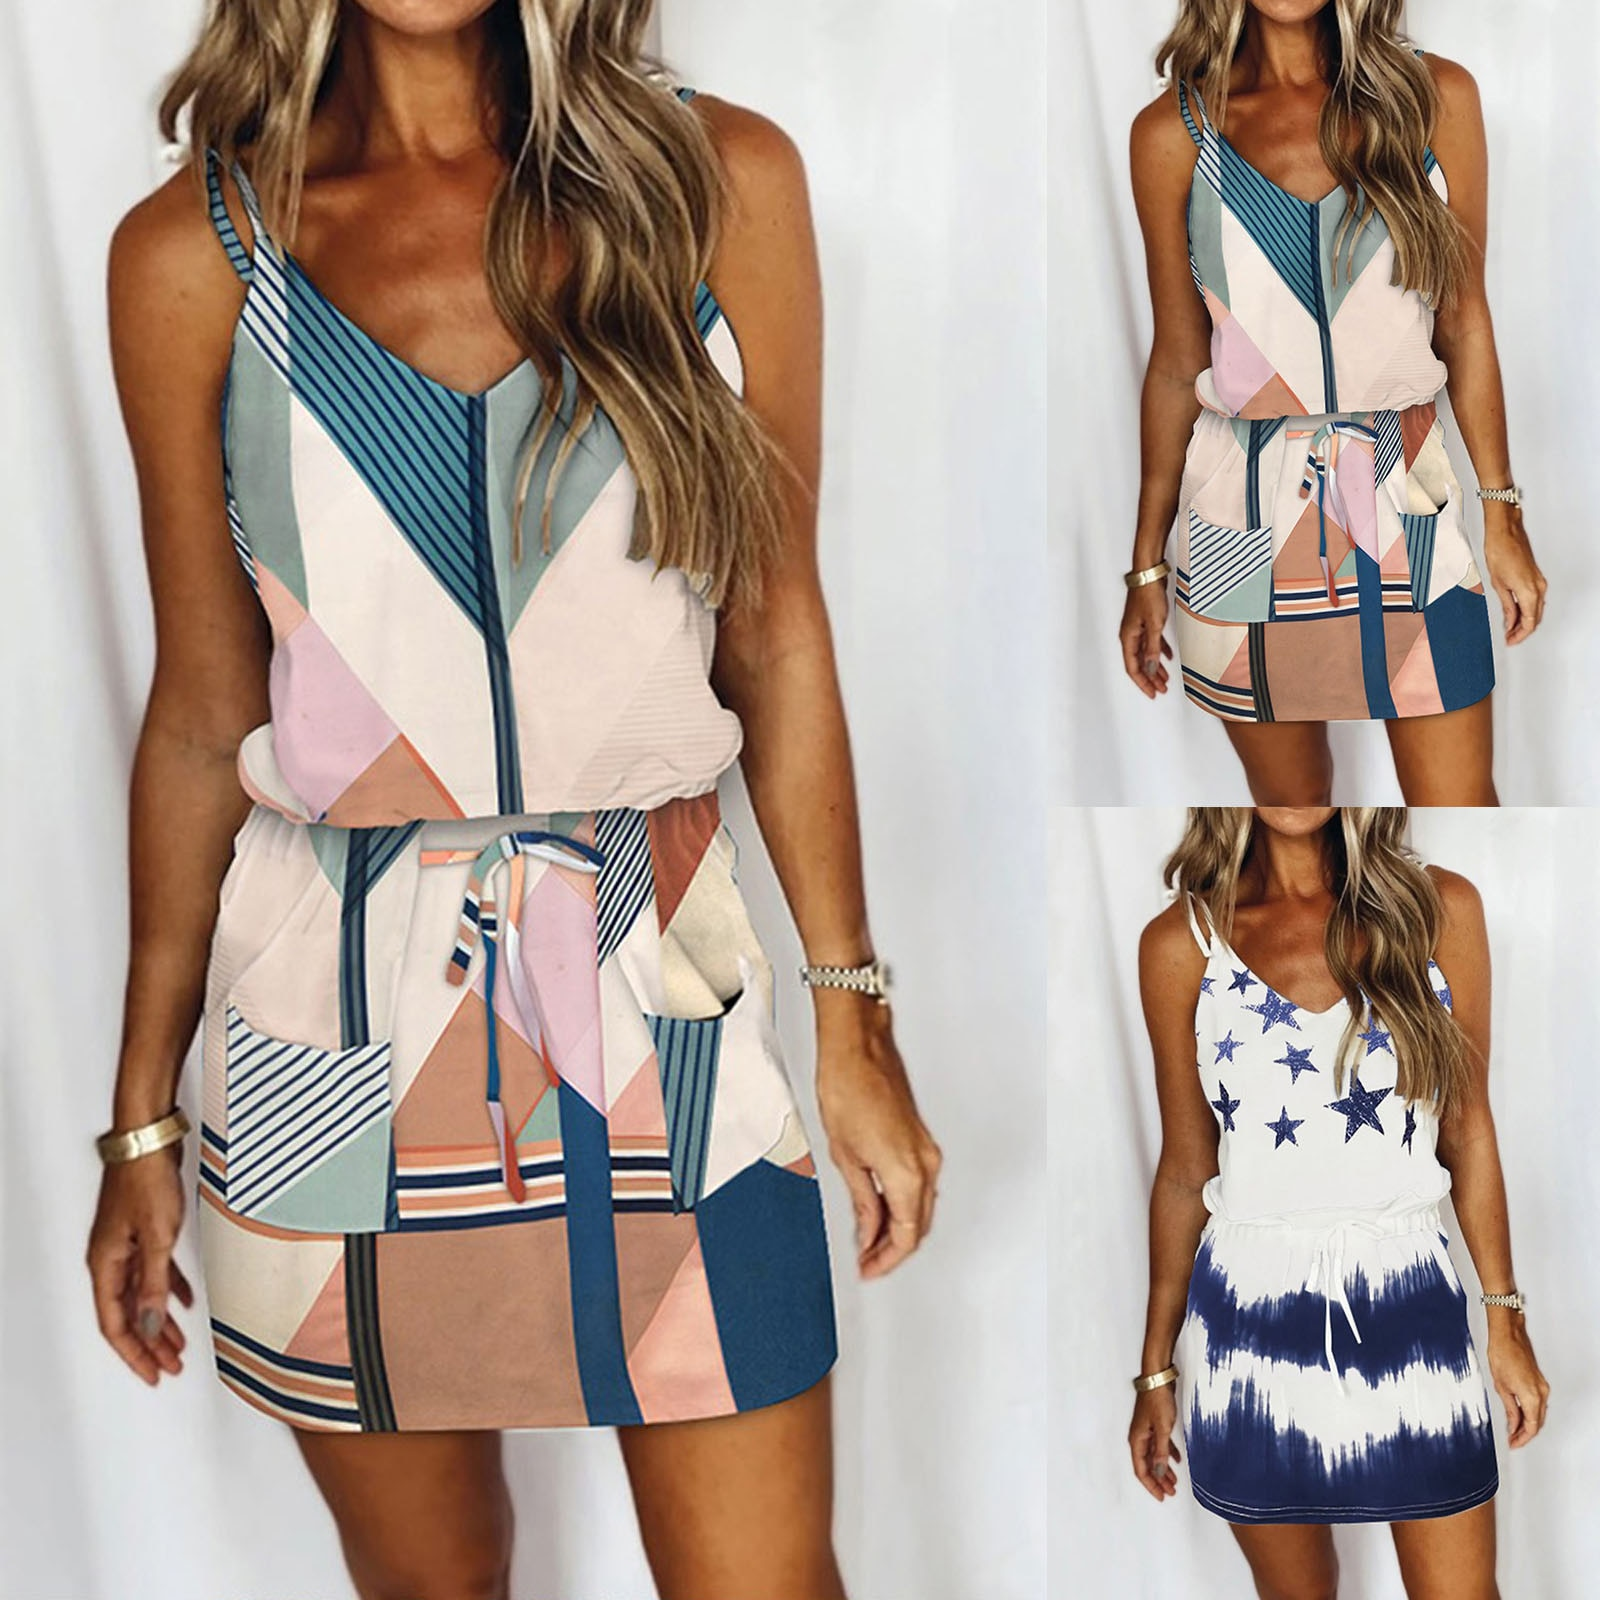 2021 New Women's Fashion Casual V-neck Short Sleeve Strap Open Back Sexy Print Dress Boho Summer Dre